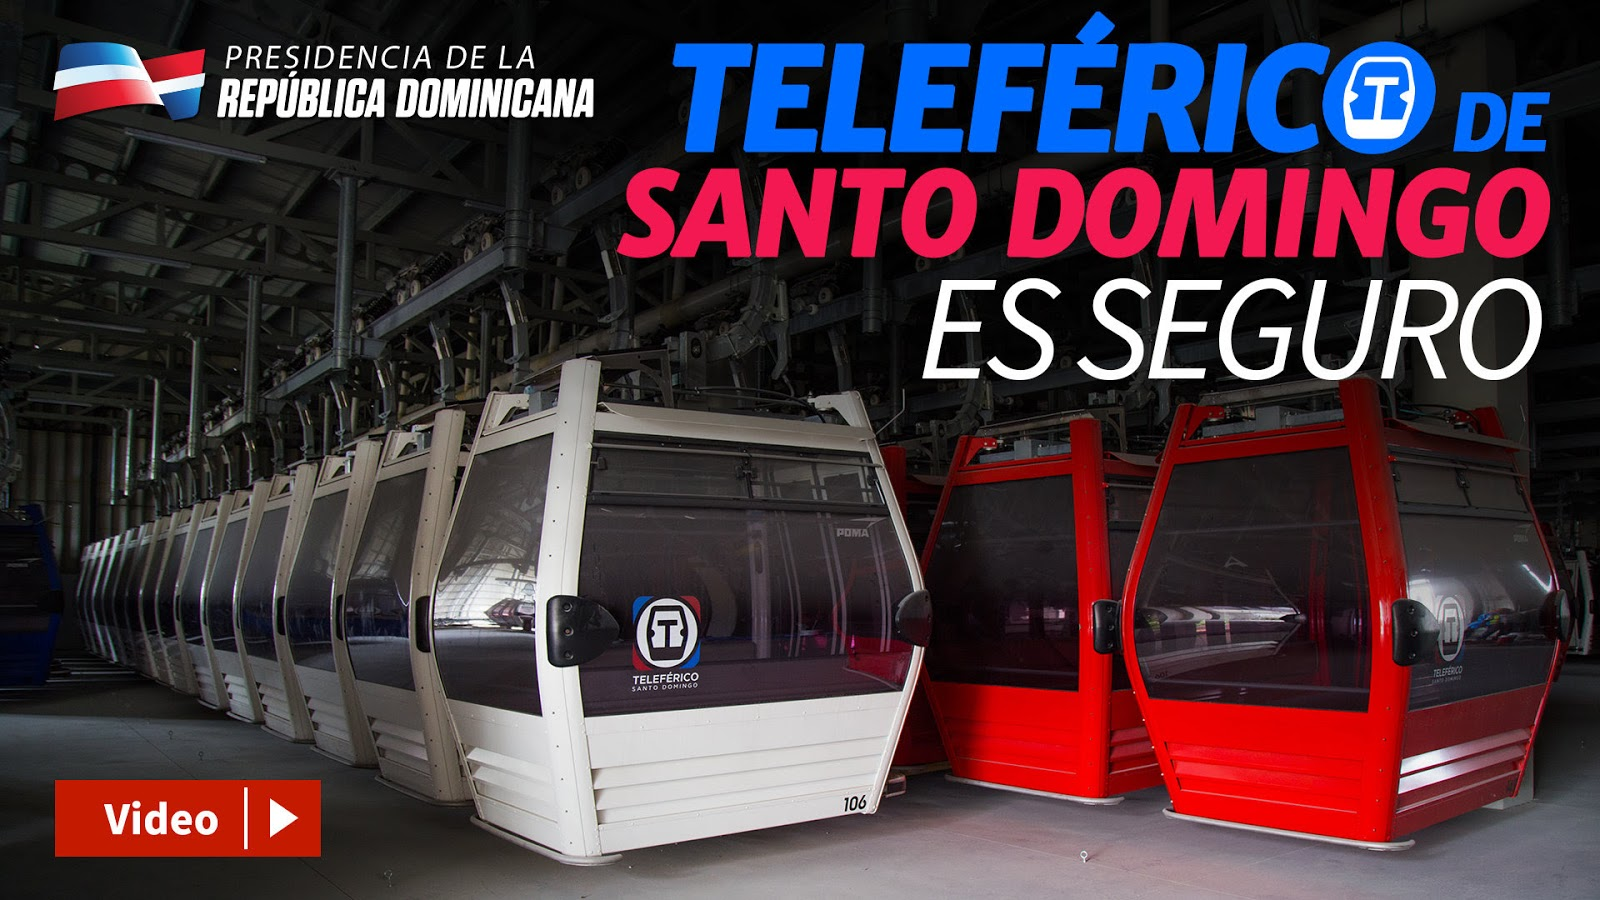 VIDEO: Teleférico de Santo Domingo es seguro